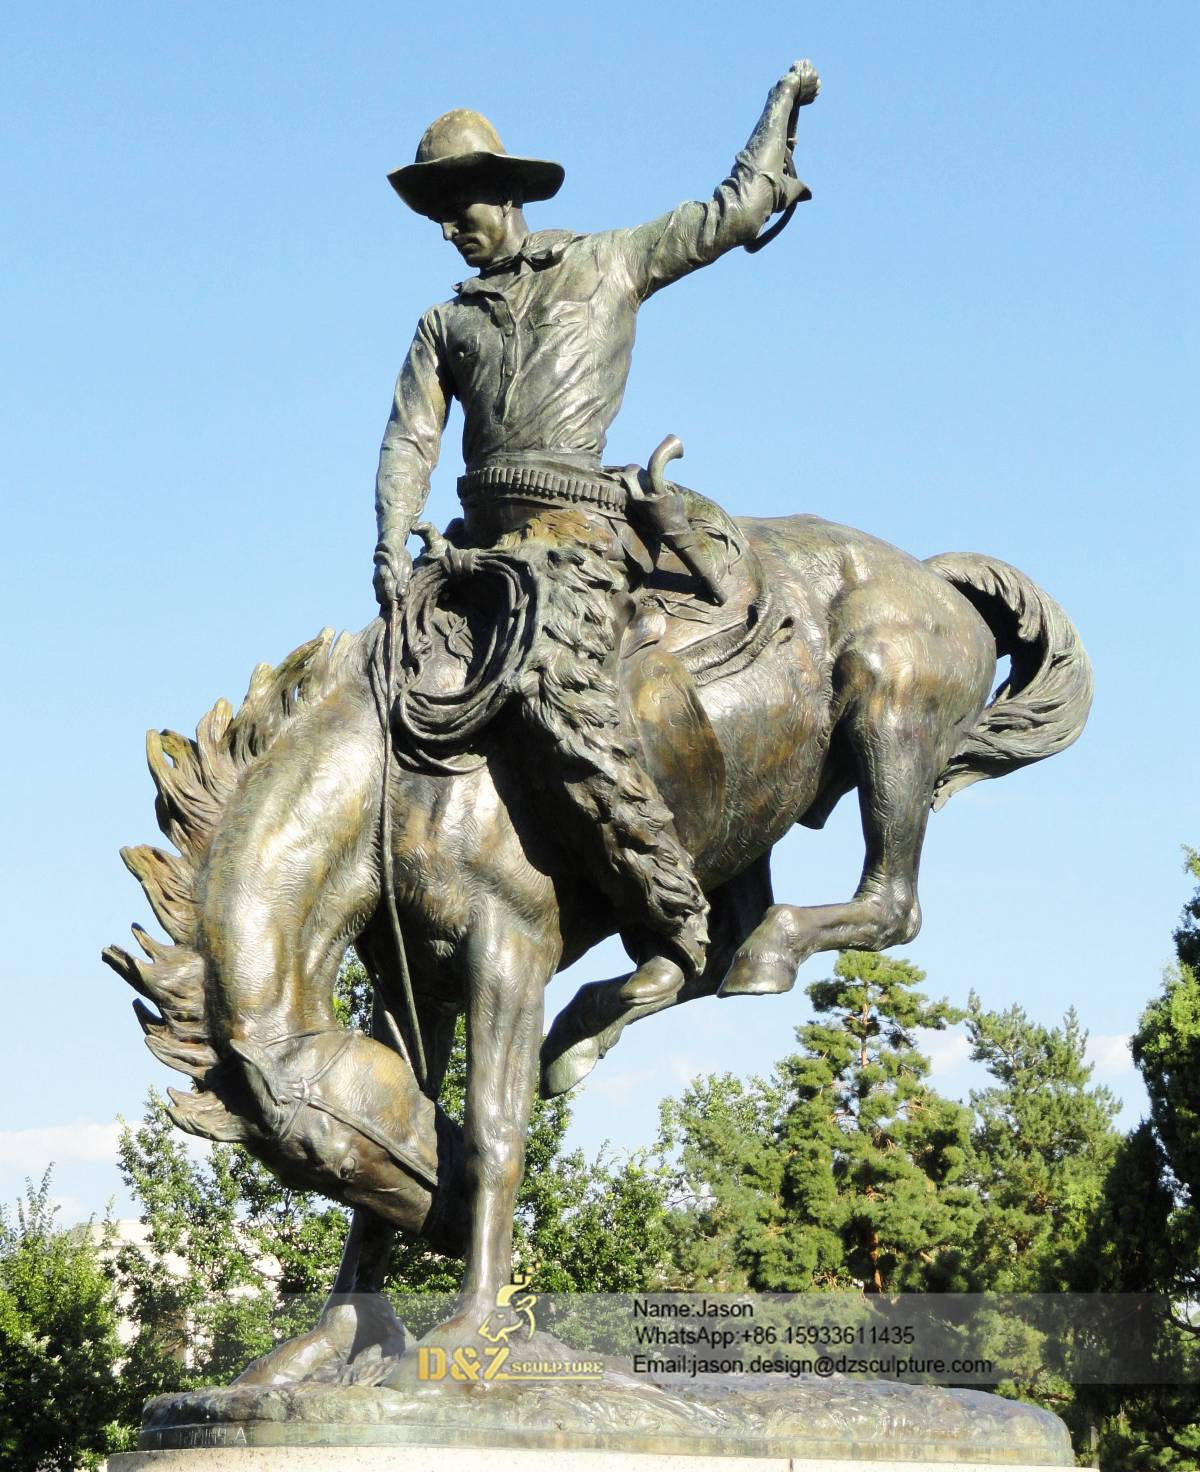 Statue monument of cowboy horse